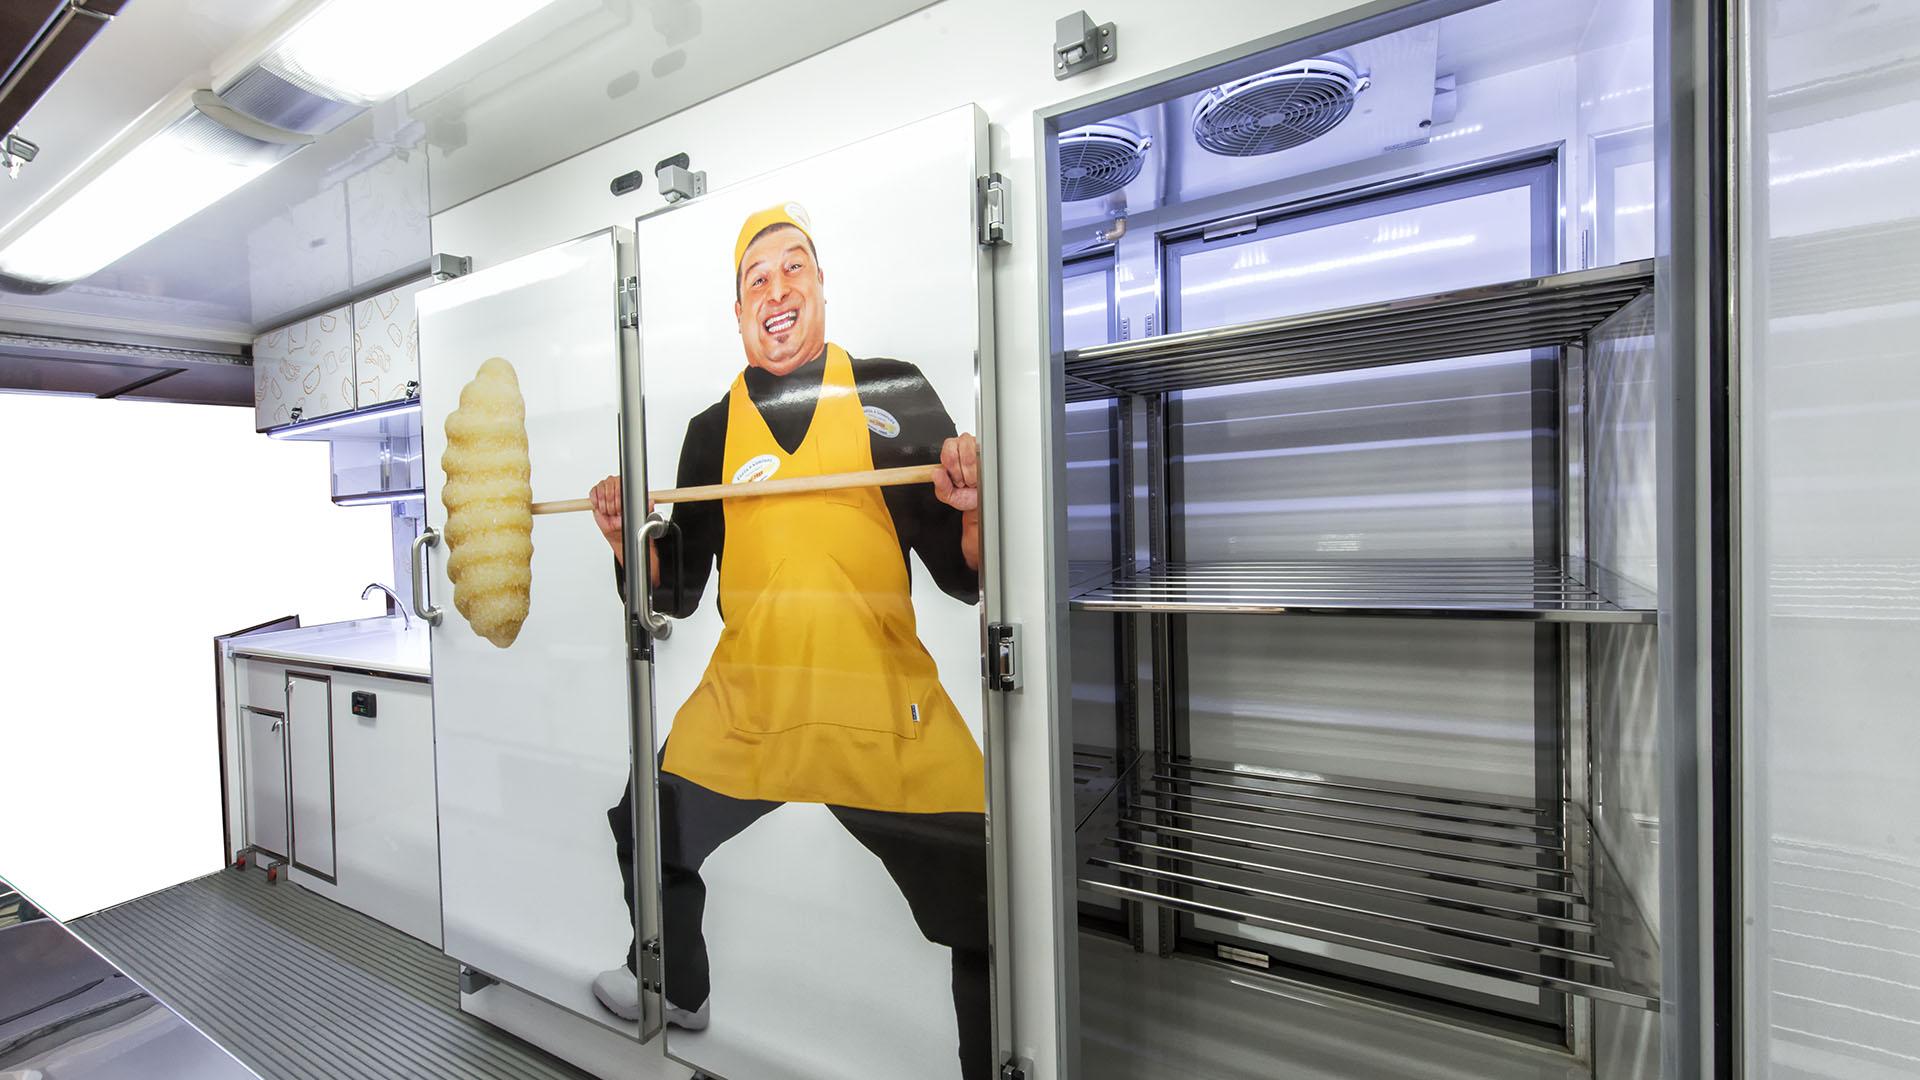 """autonegozi-linea-spagna-alimentare-52-9"""